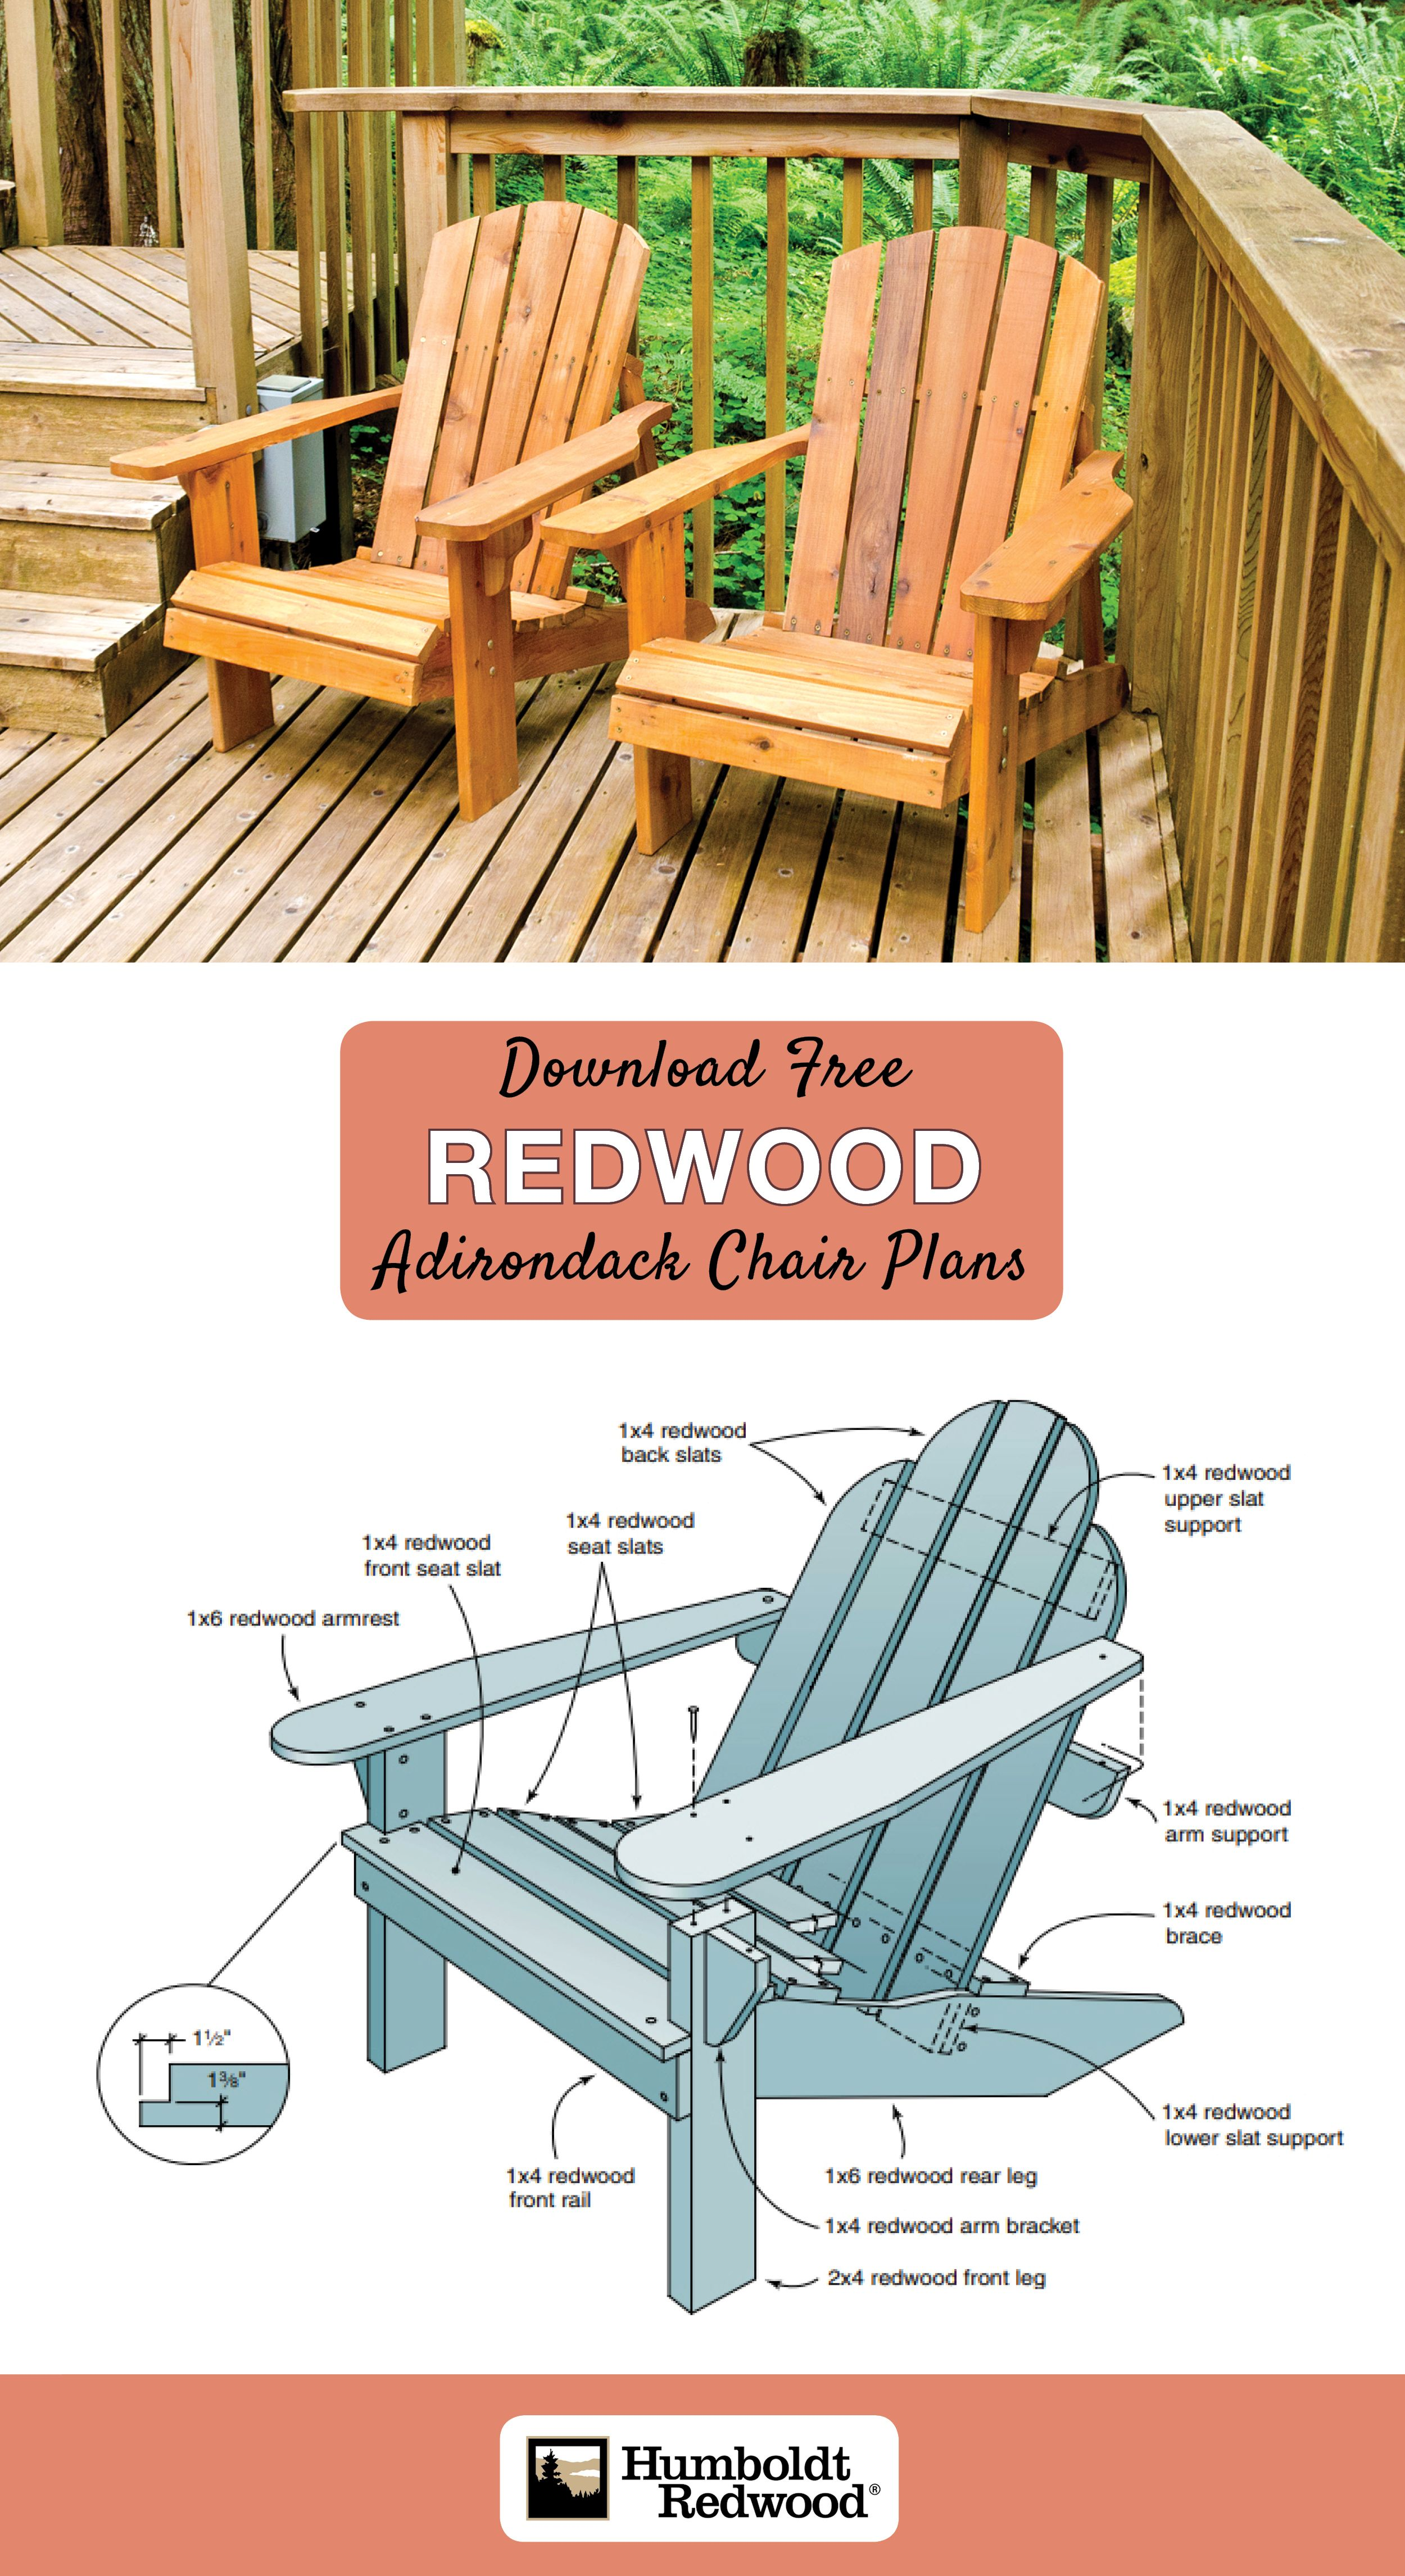 Redwood Adirondack Chair Plans Adirondack Chair Adirondack Chair Plans Elegant Chair